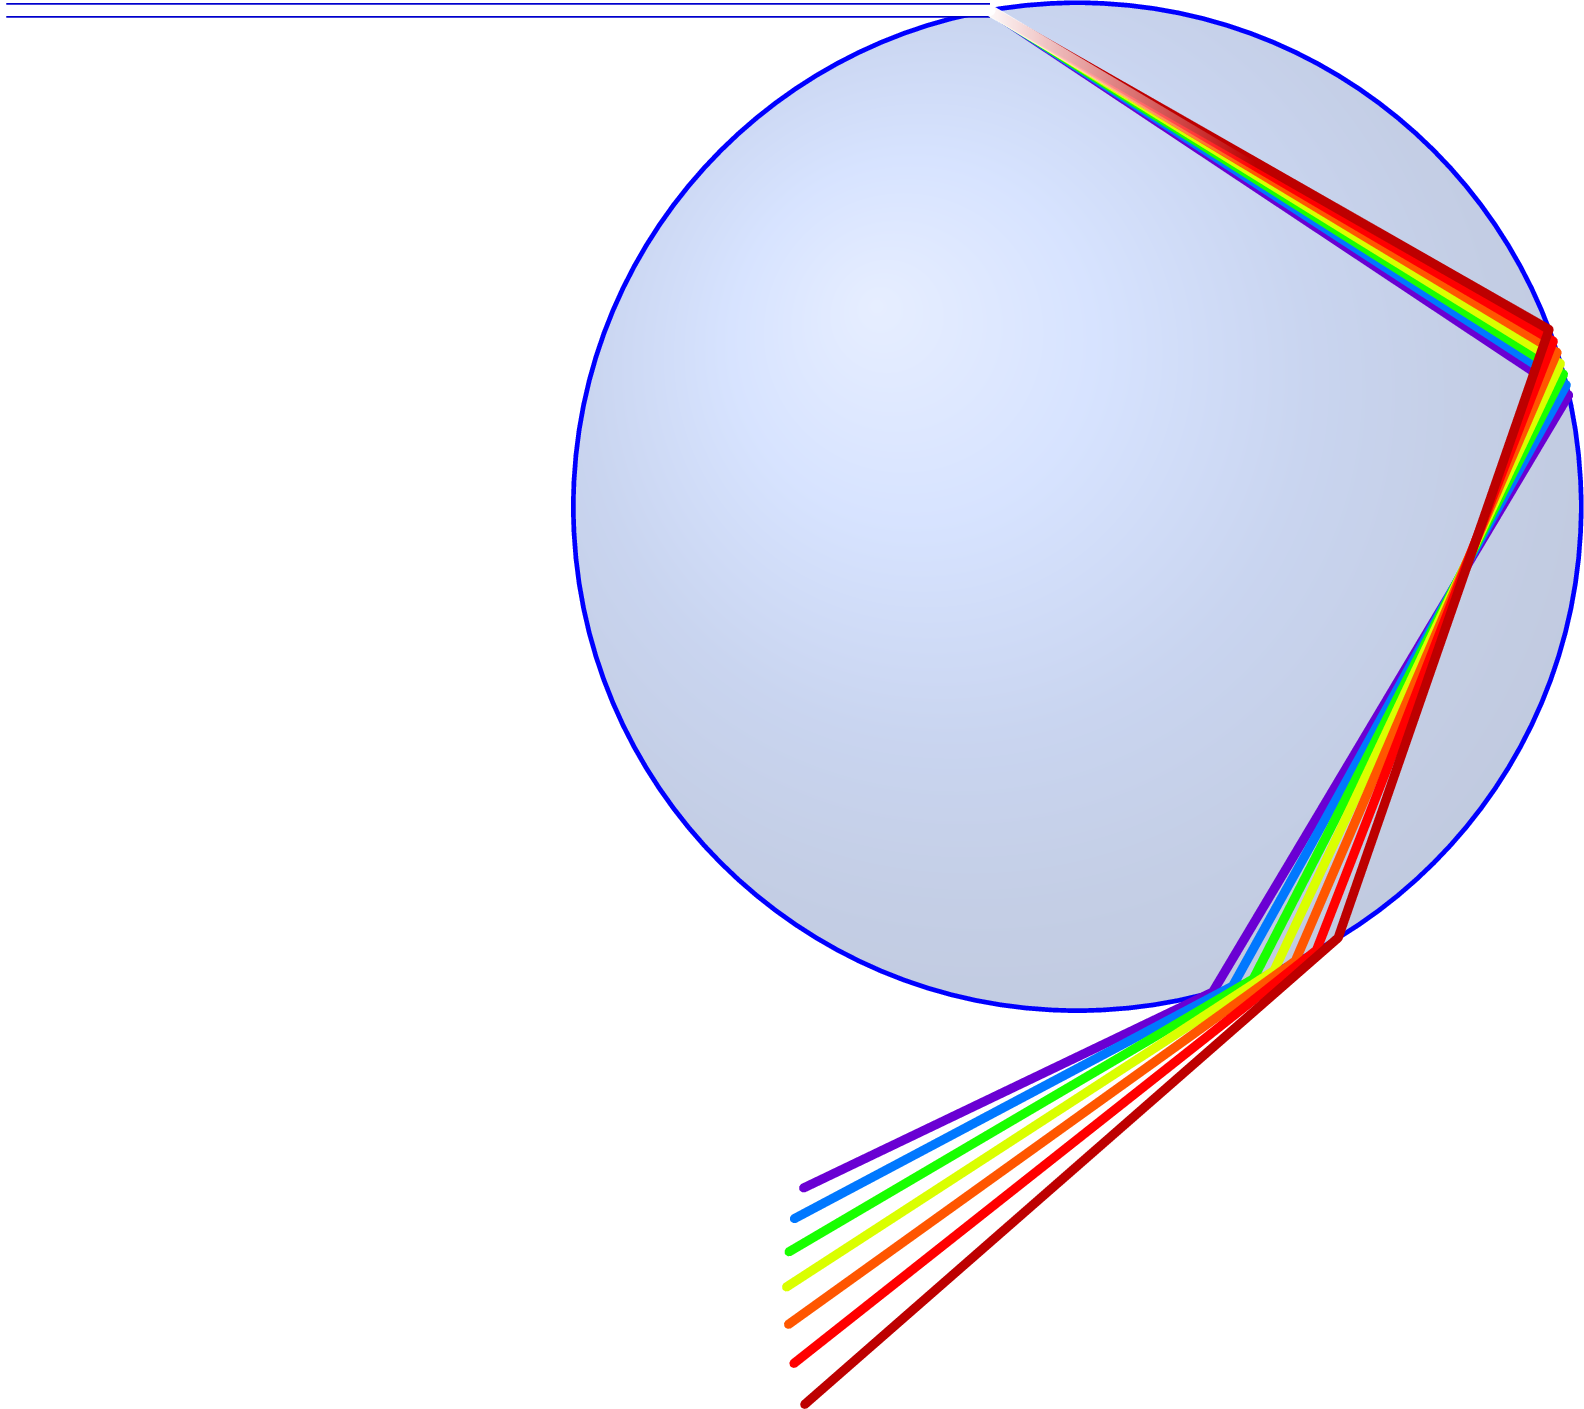 optics_rainbow-003.png